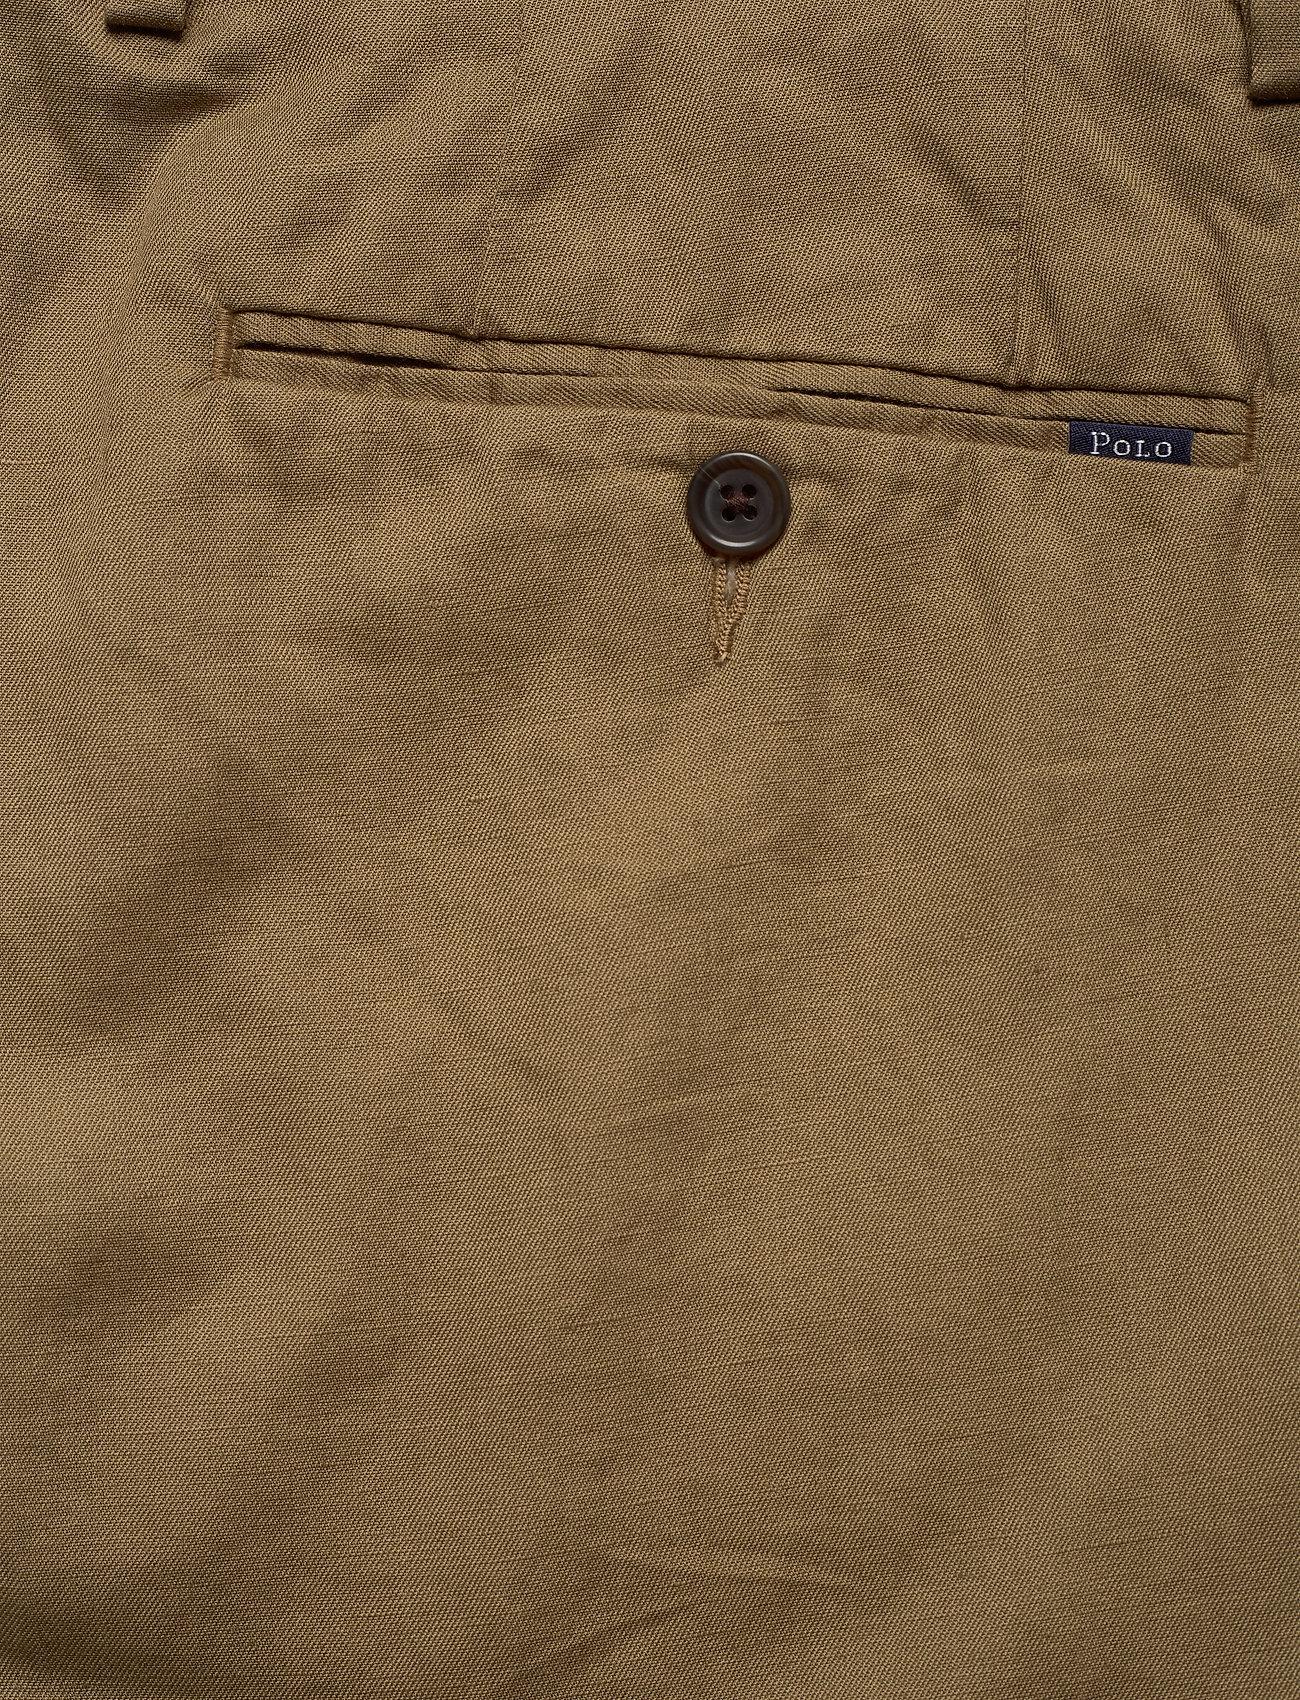 Classic Fit Twill Short (Desert Khaki) (836.50 kr) - Polo Ralph Lauren